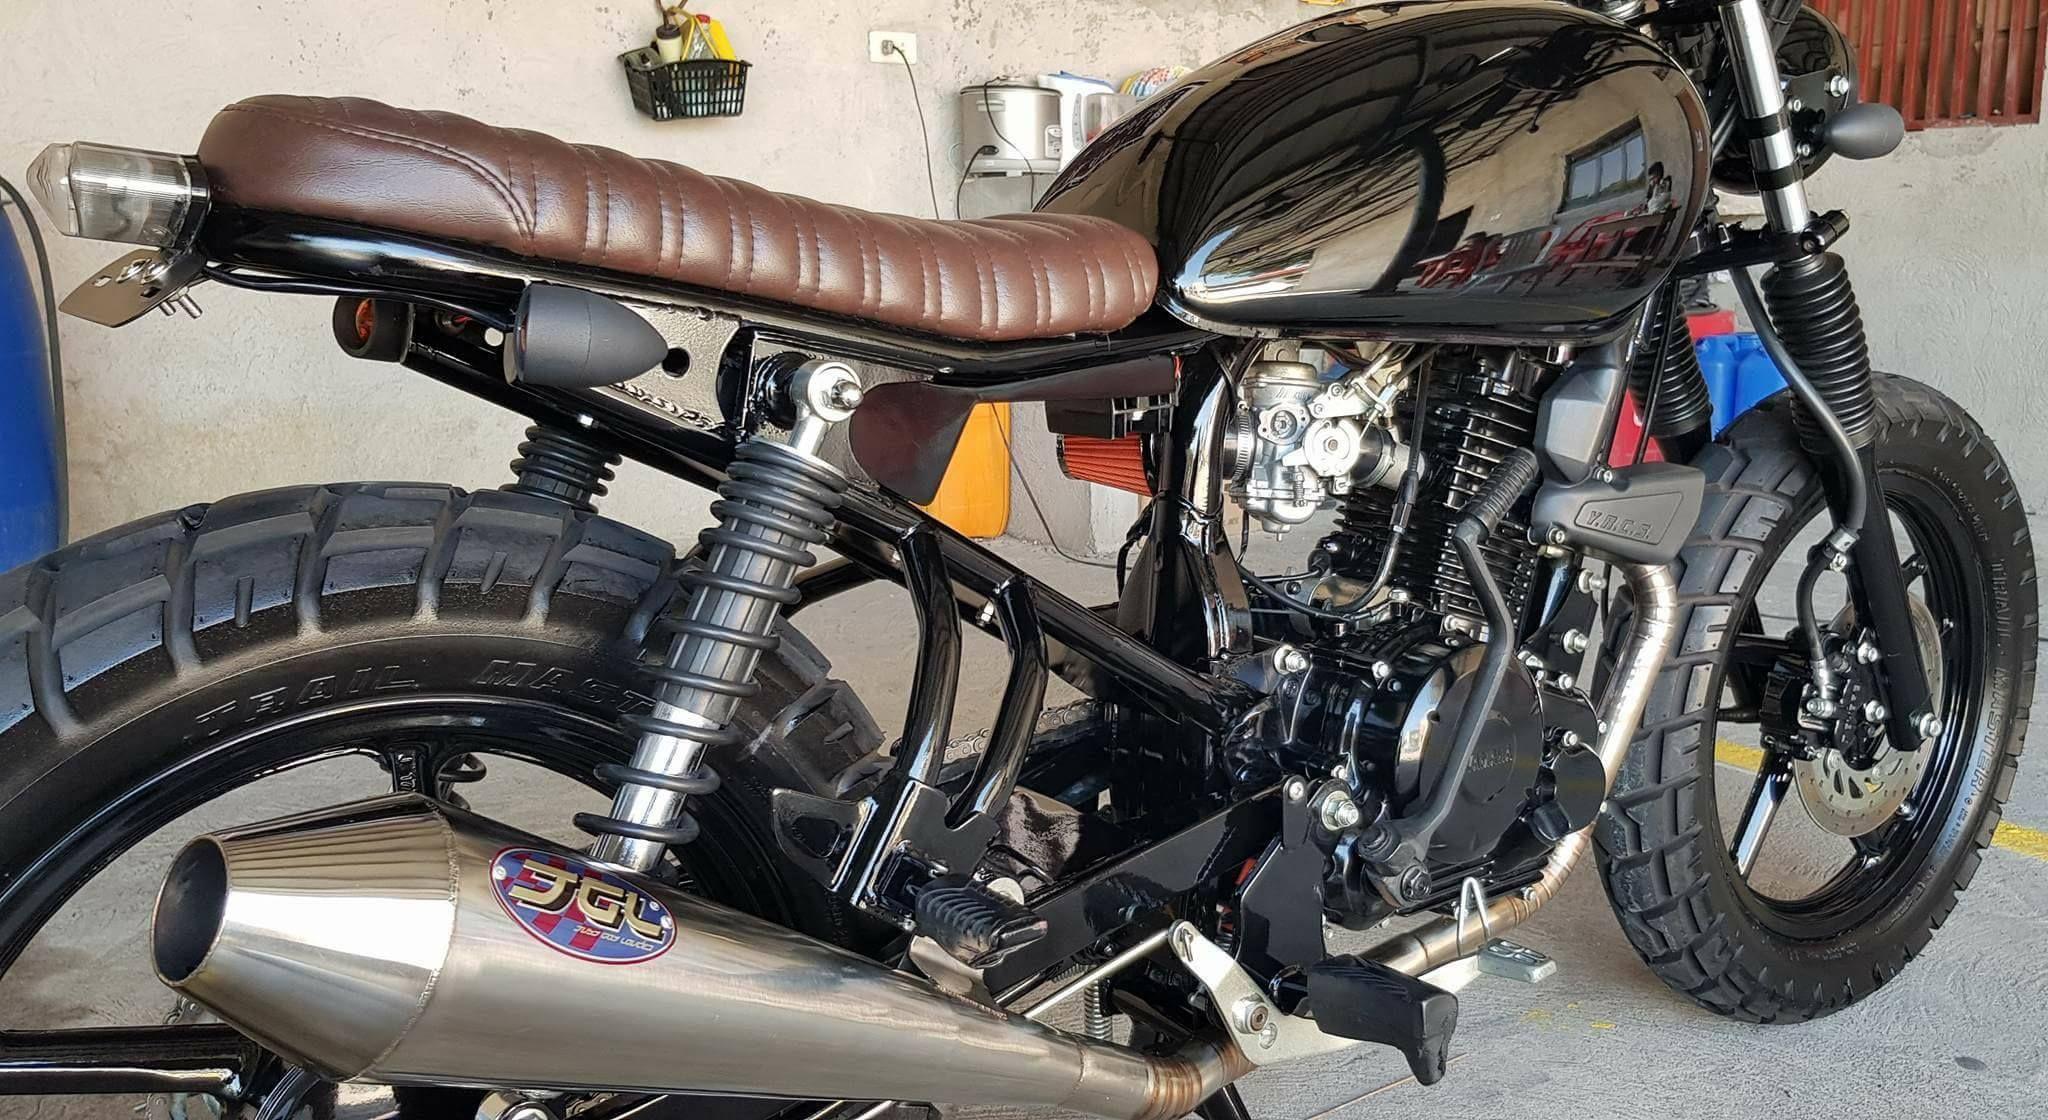 Pin by Richard Is on yamaha sz16 Scrambler motorcycle